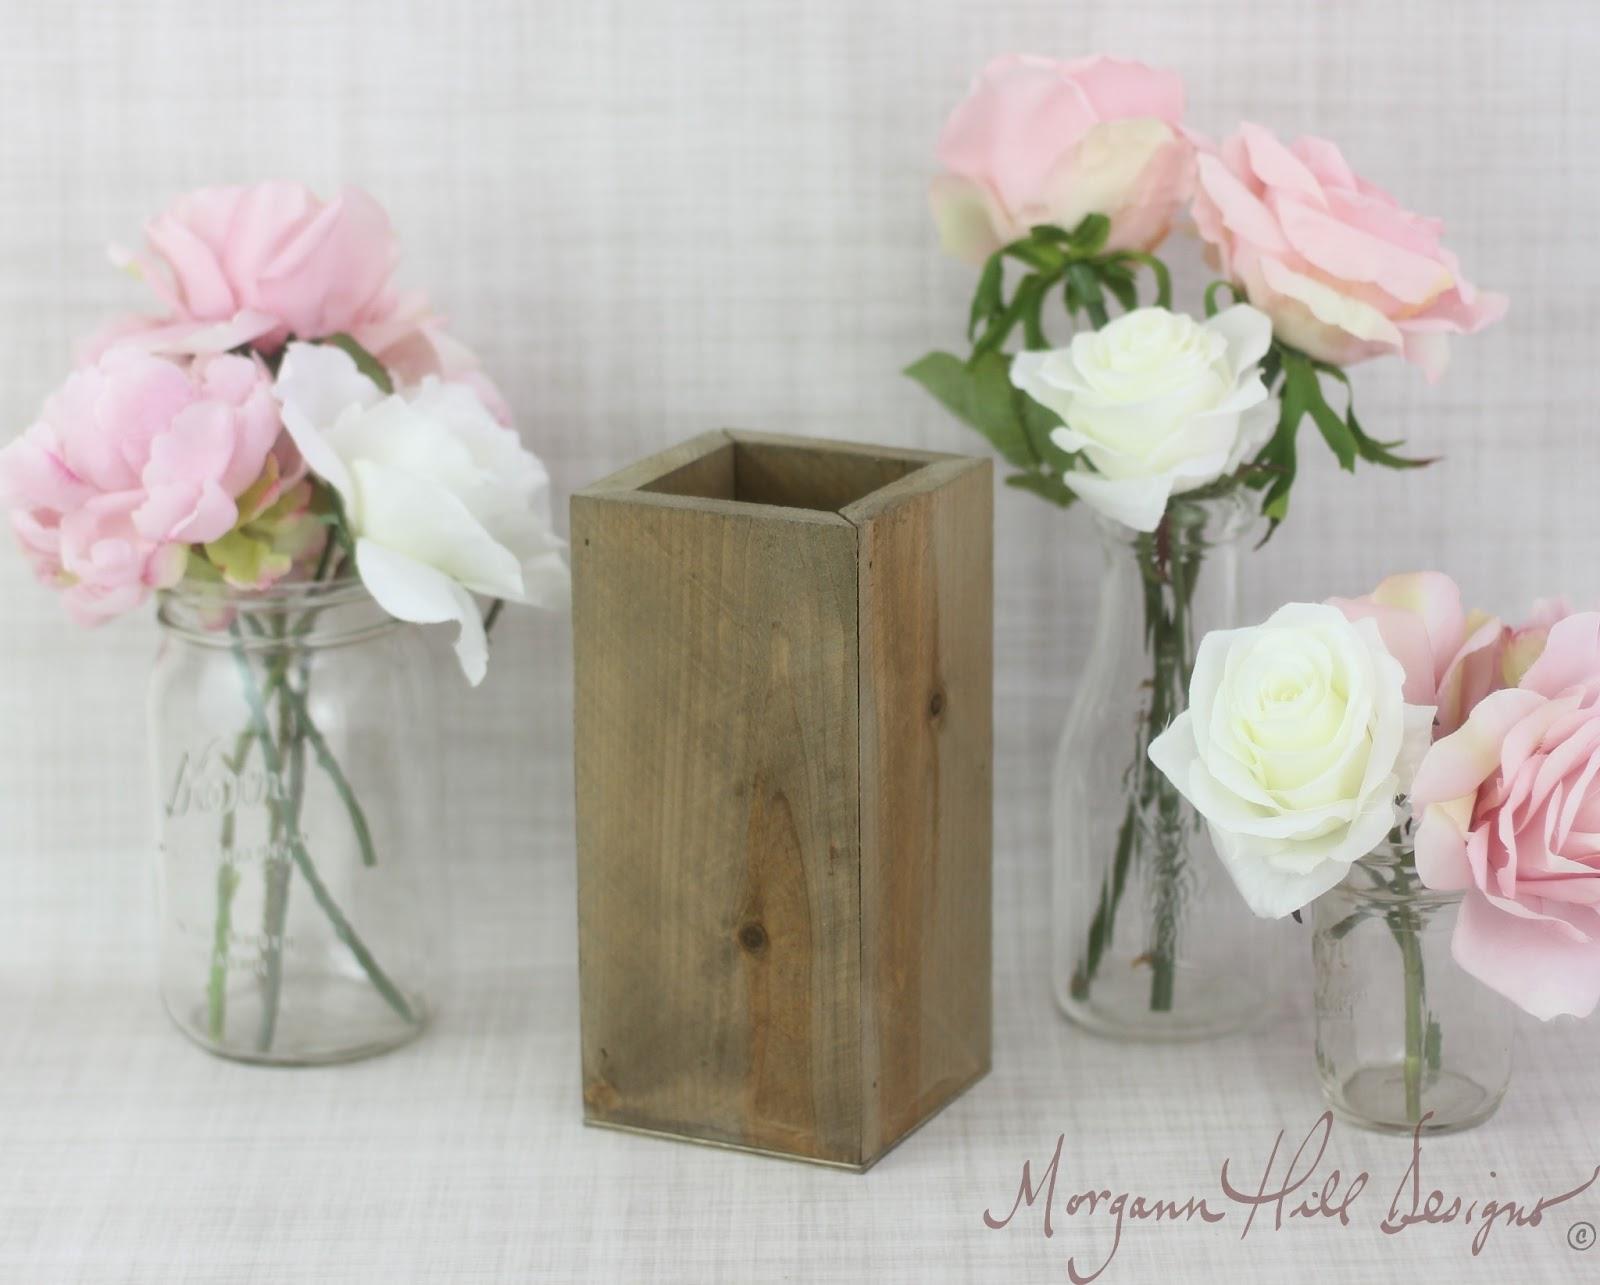 Morgann hill designs tall rustic planter box wedding